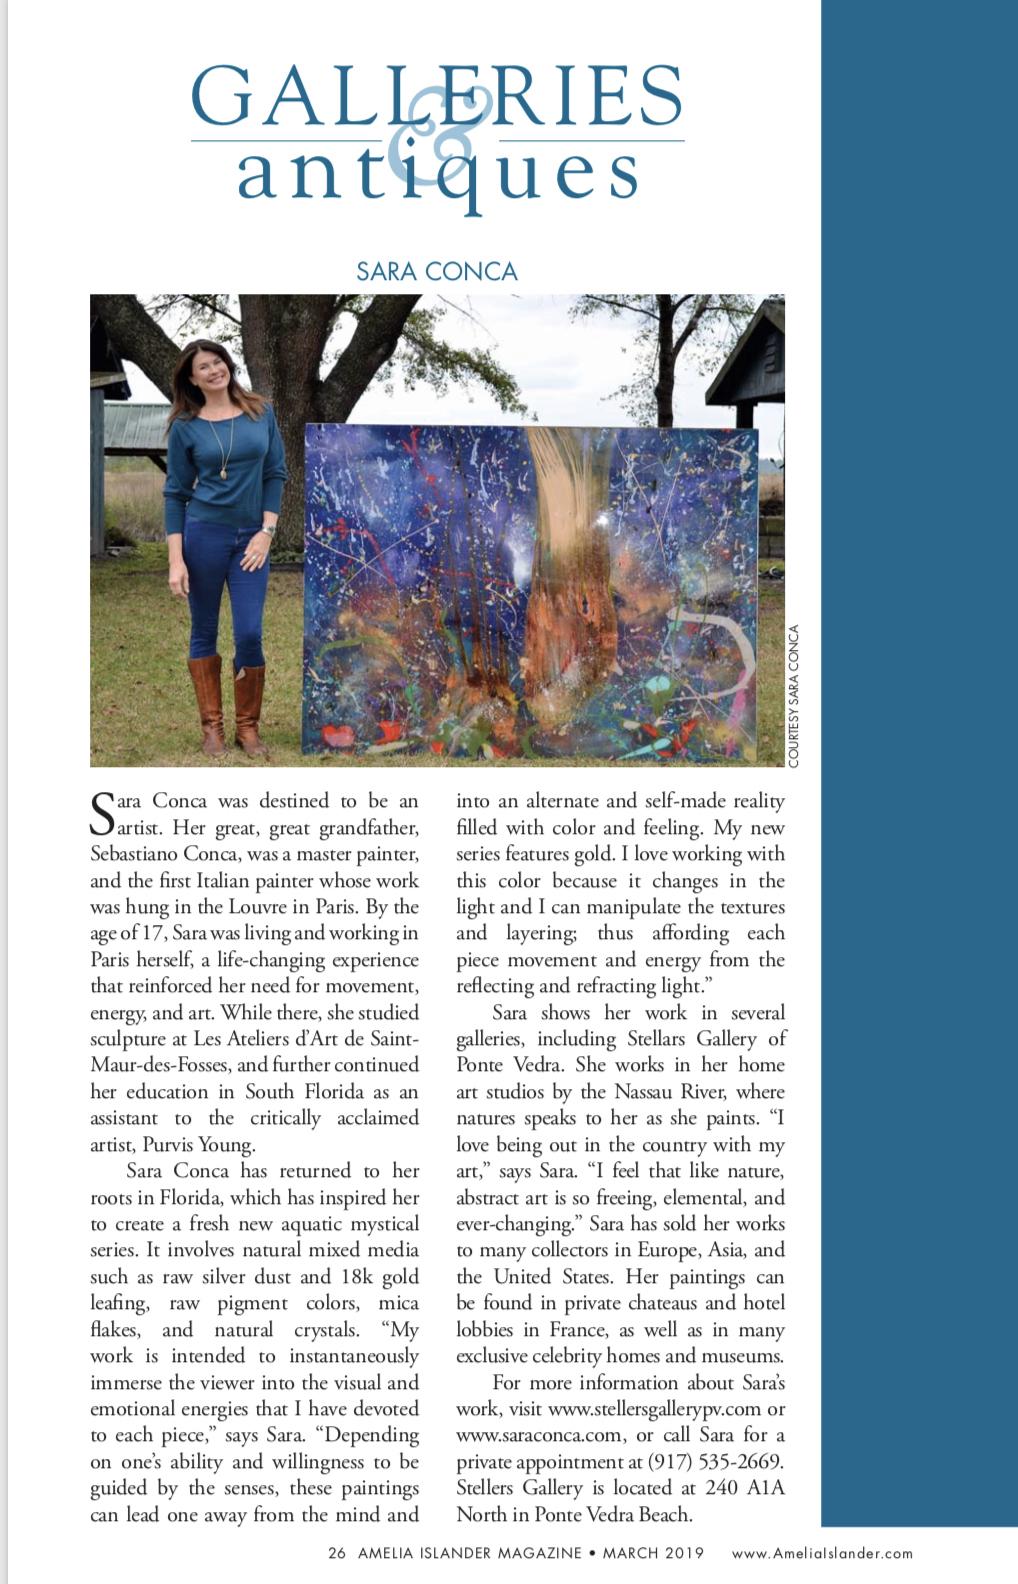 Amelia Islander Magazine Mar 2019